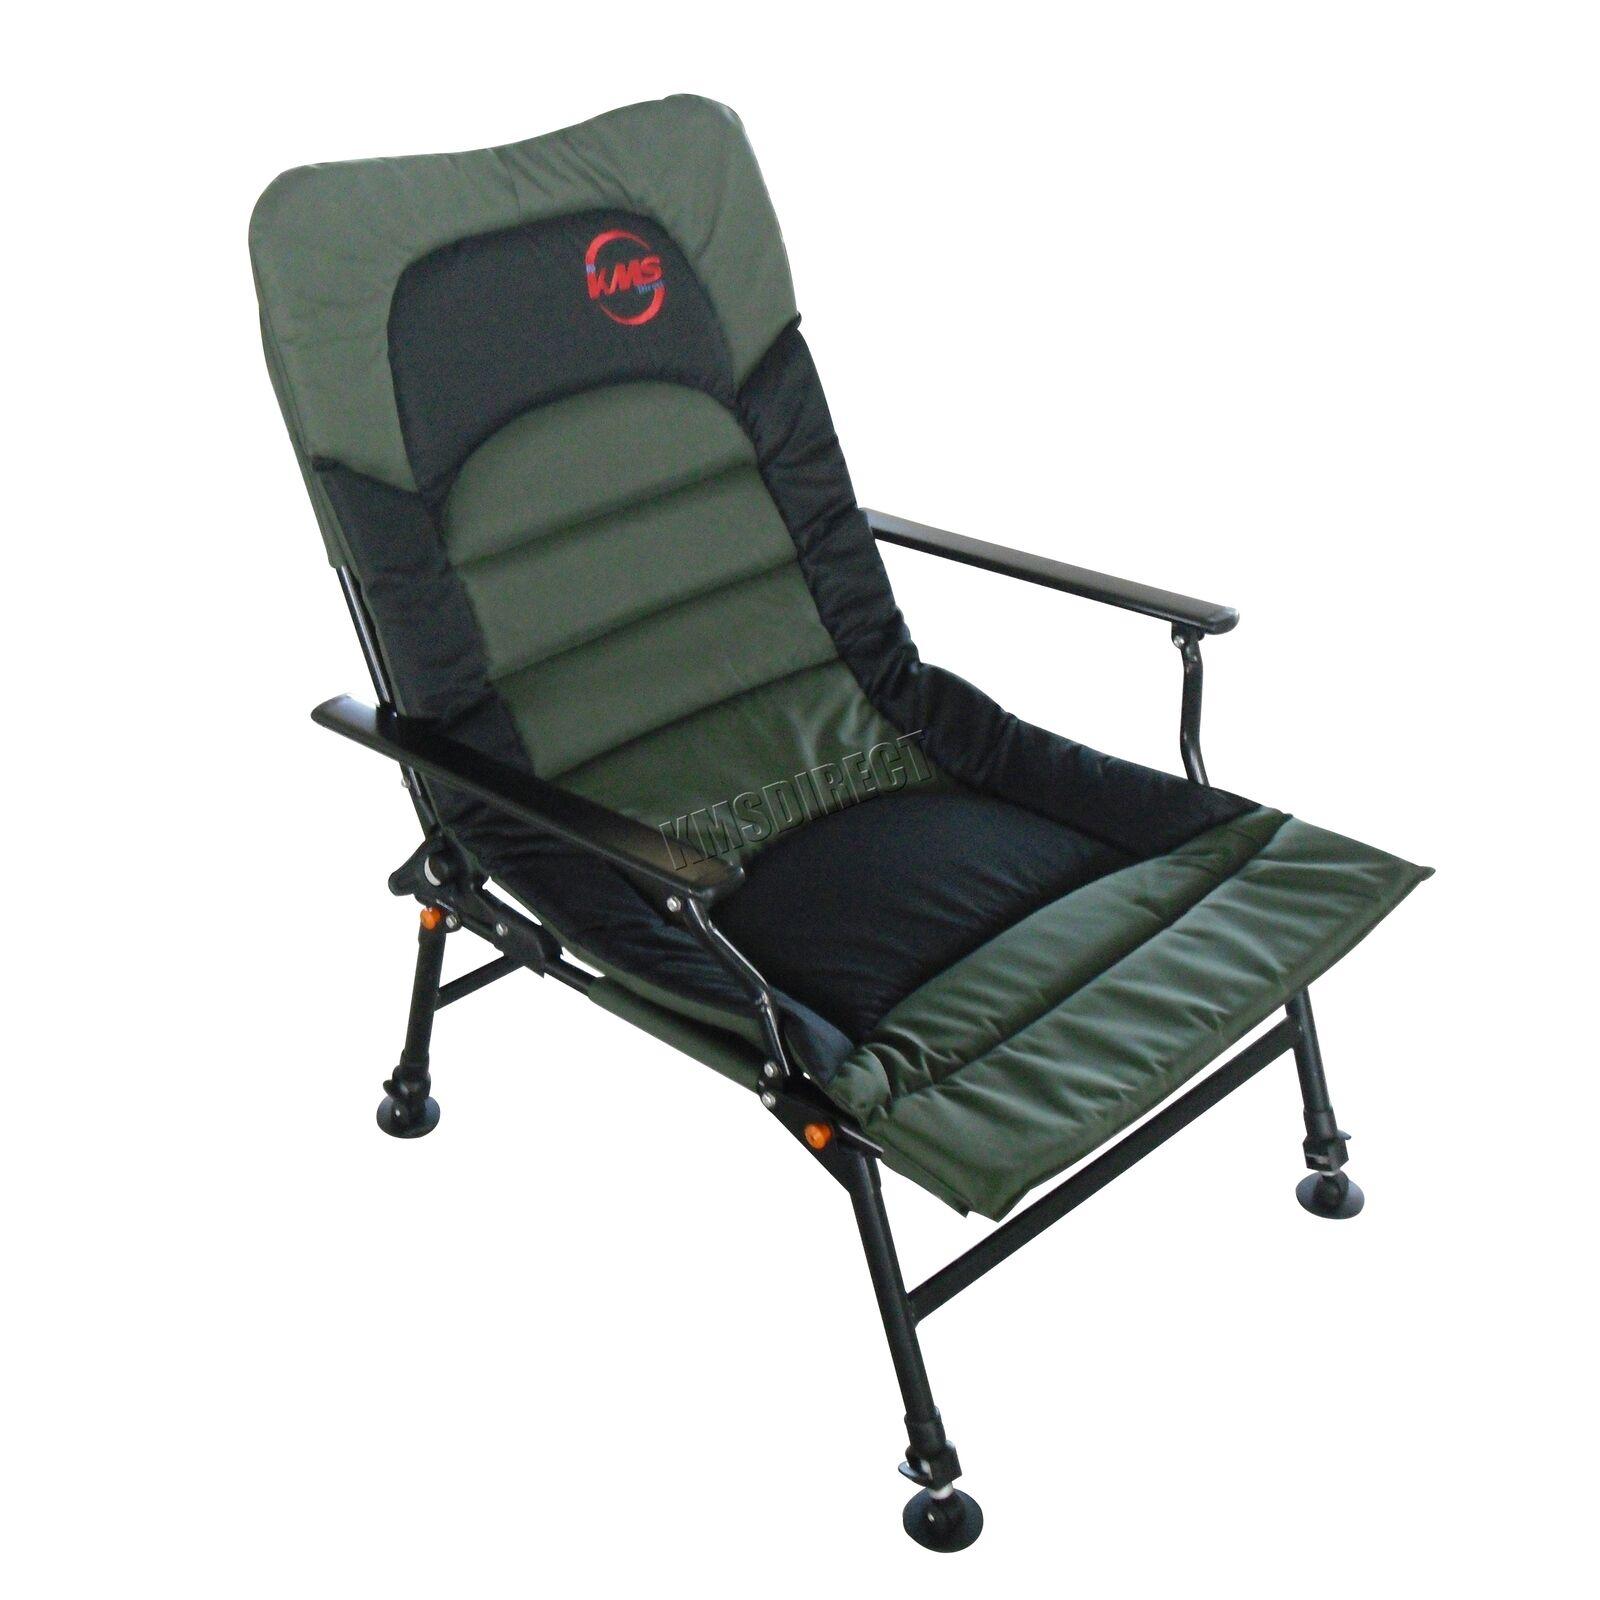 Camping Fishing Chair – XL Carp Grün Fishing Equipment Folding Adjustable Legs